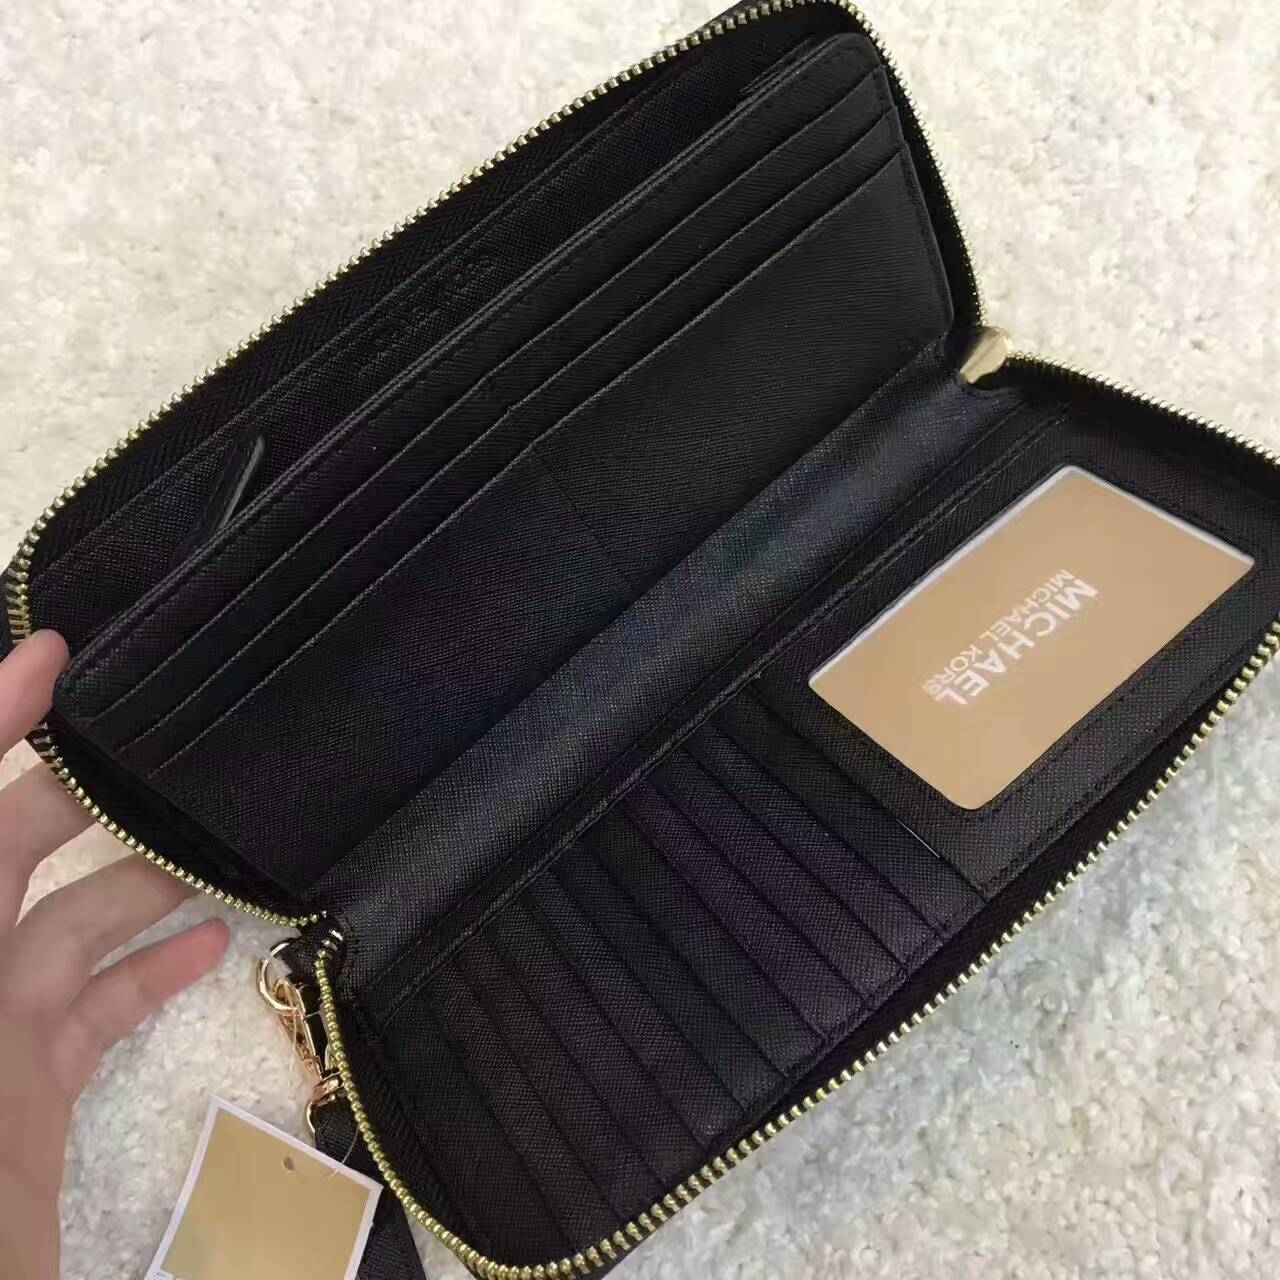 669a910b5ce8 Auth Michael Kors Jet Set Travel Leather Continental Wallet Wristlet ...